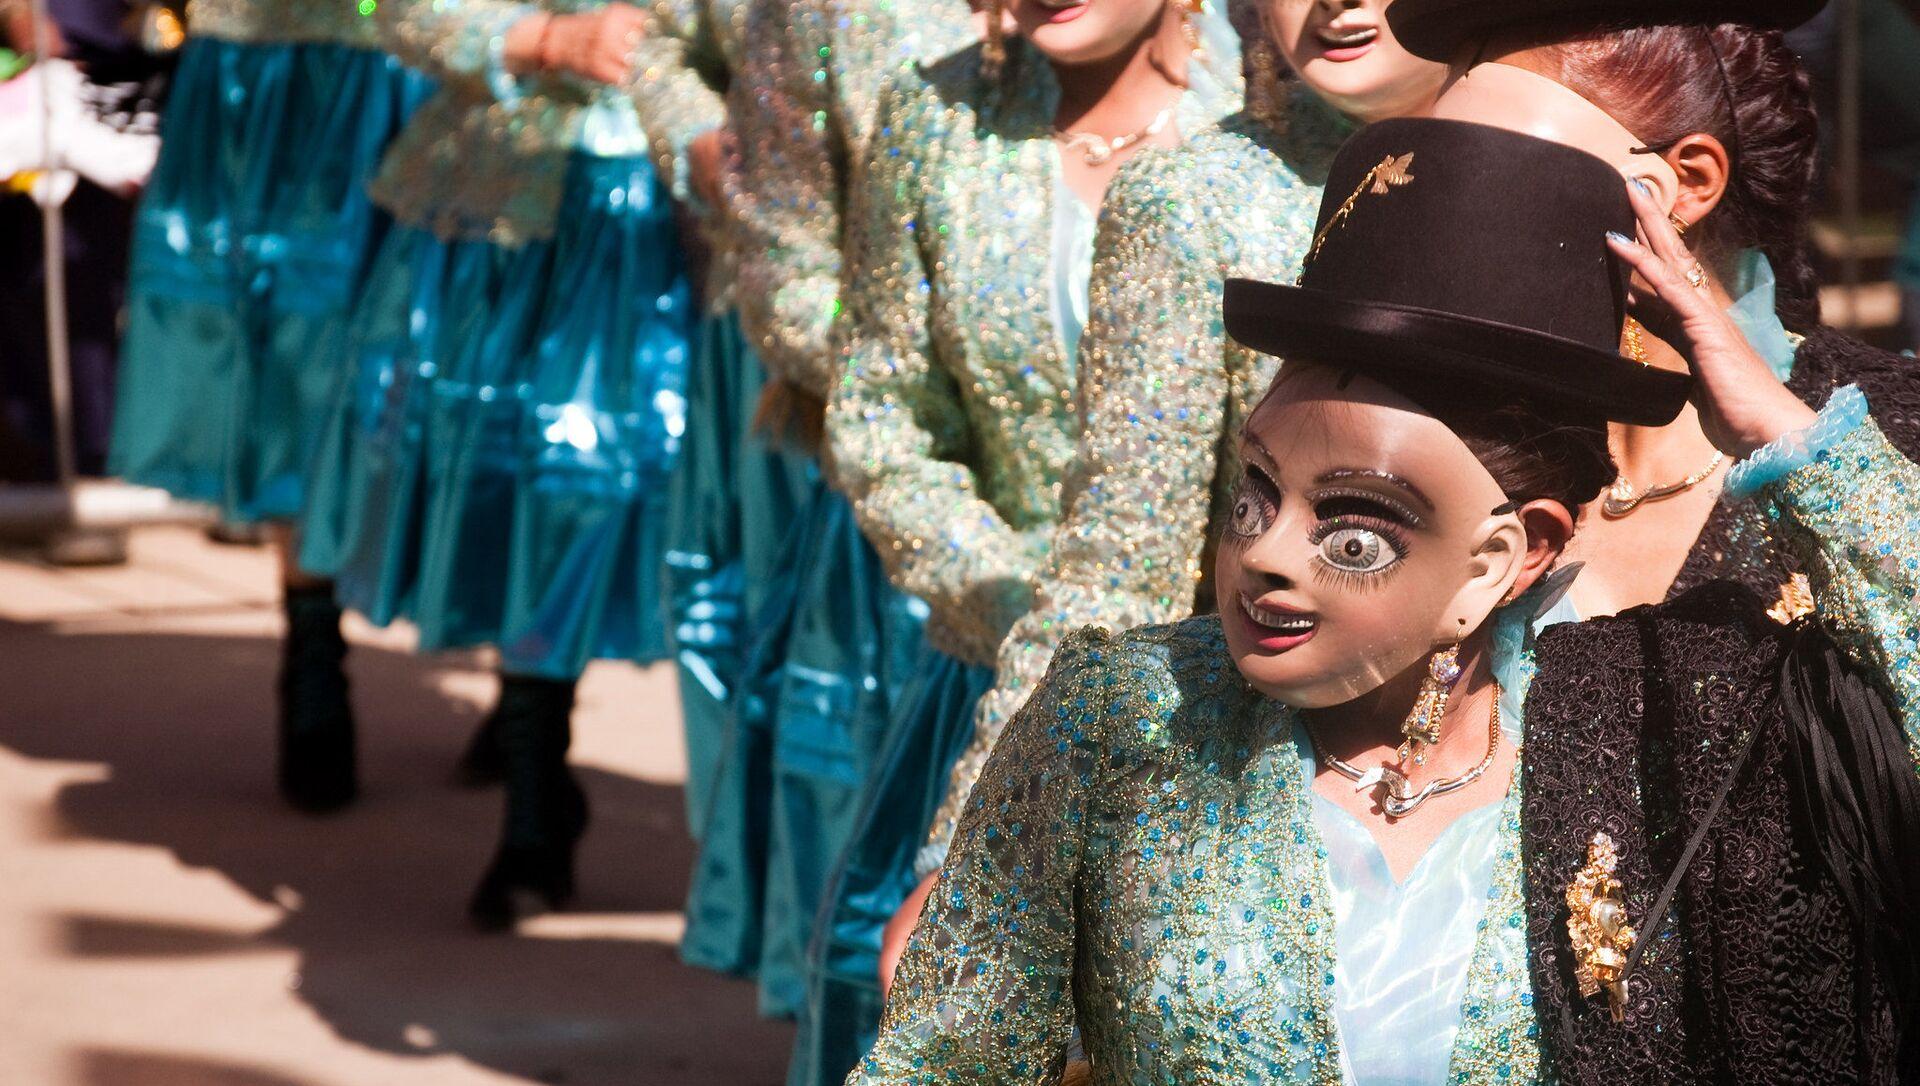 Carnaval de Oruro - Sputnik Mundo, 1920, 16.01.2021